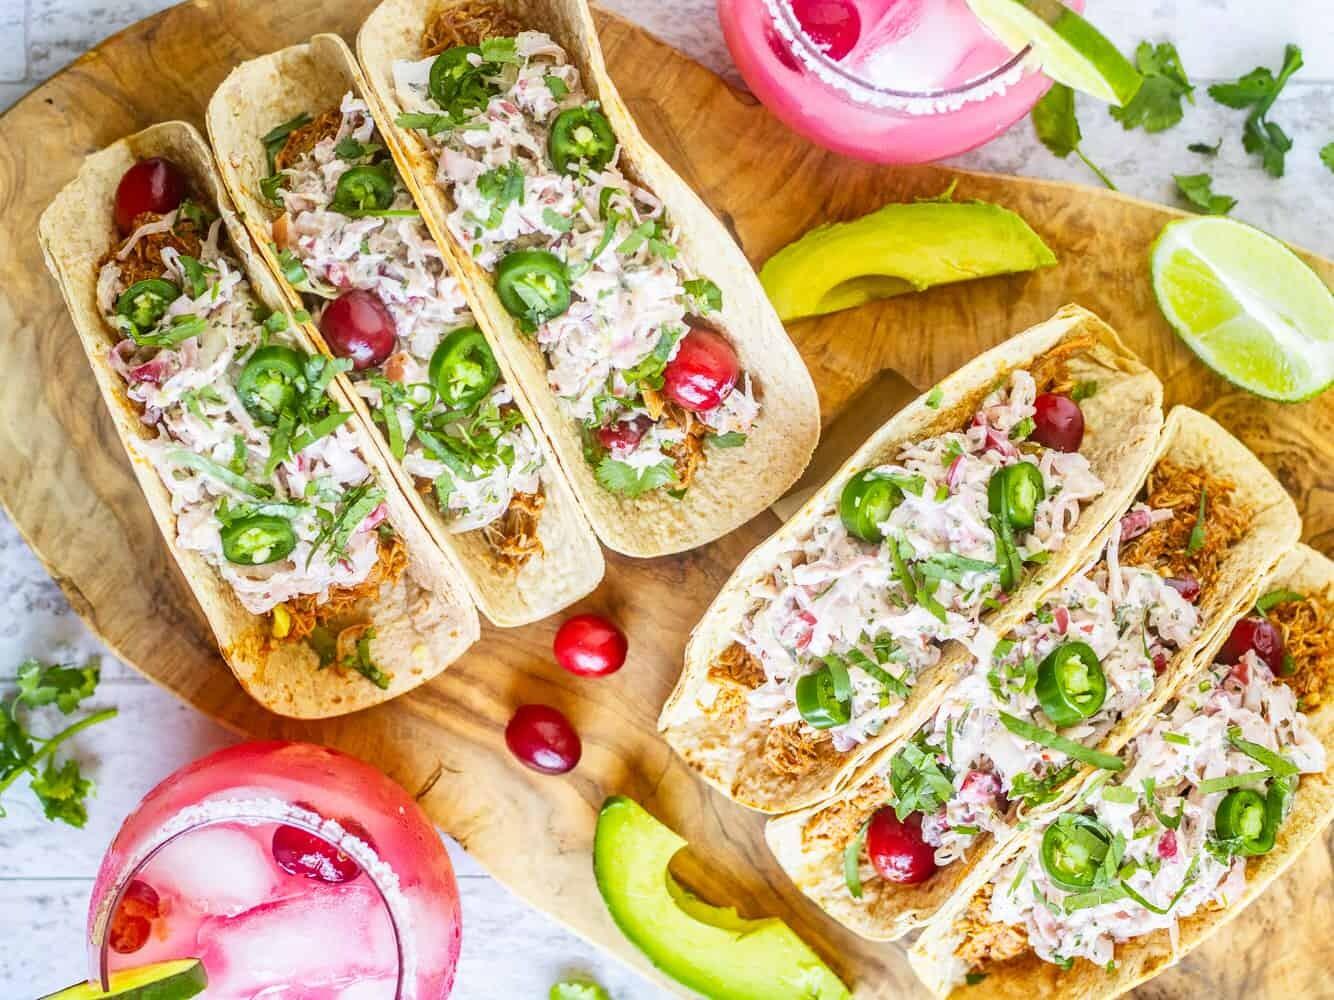 Instant Pot Cranberry Chipotle Chicken Tacos - Low Carb, Keto Tacos